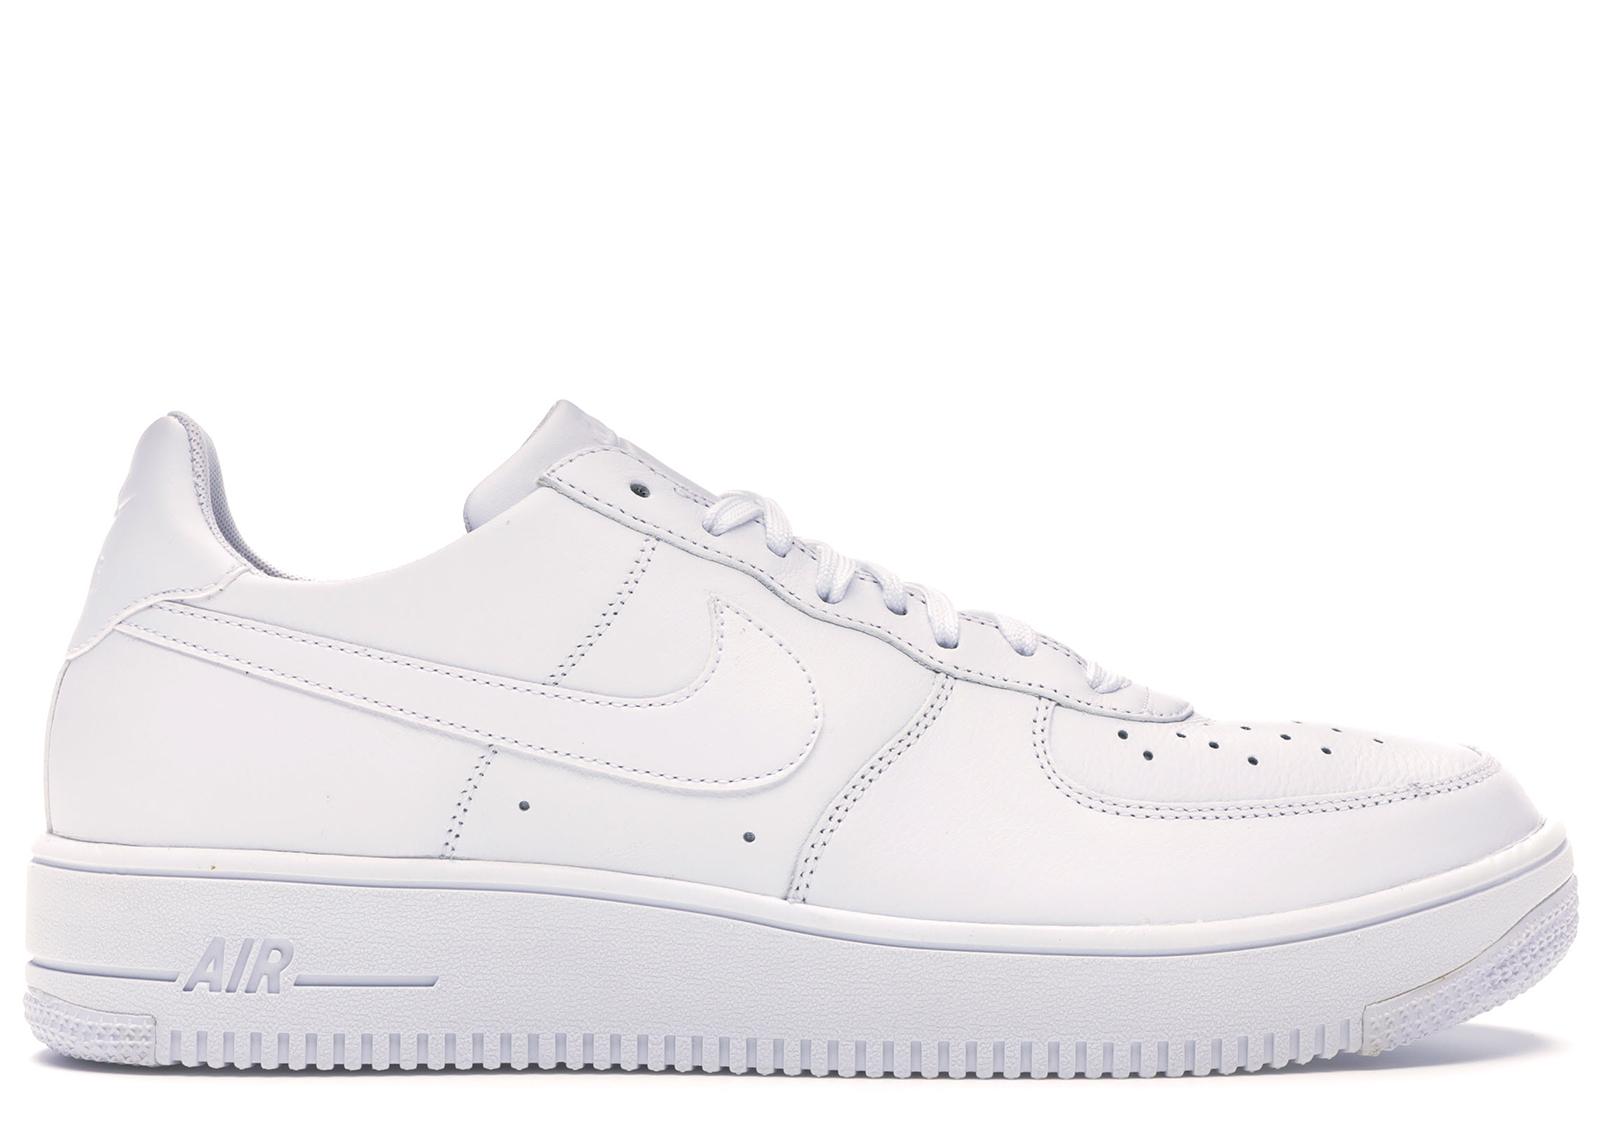 Nike Air Force 1 Ultraforce Low Triple White - 845052-101